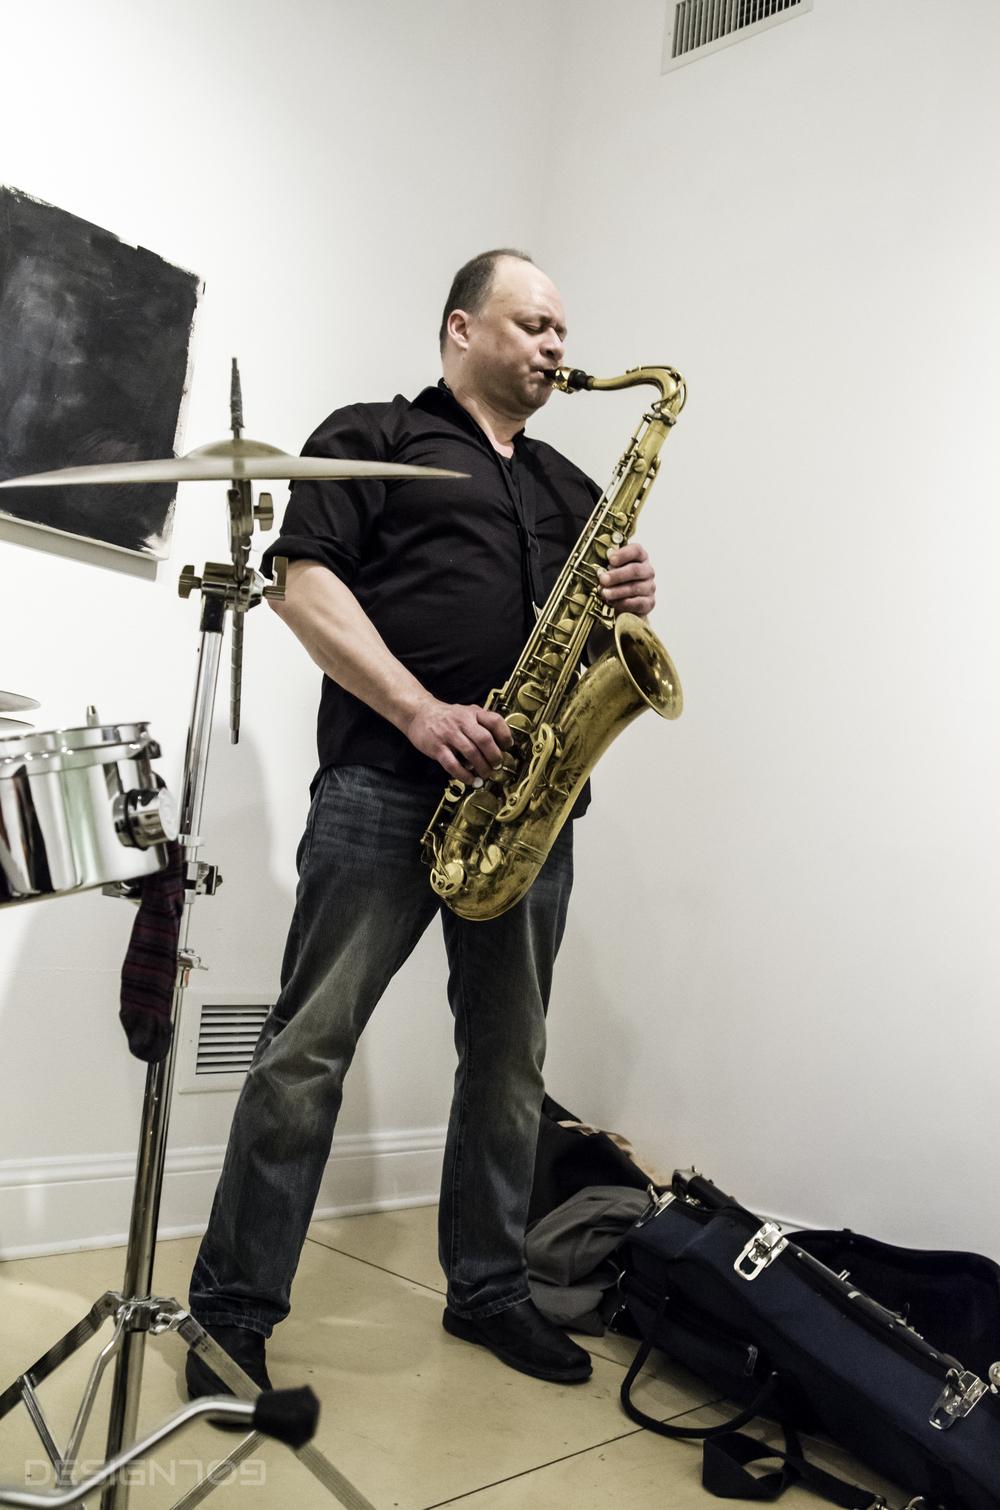 Dennis on sax!